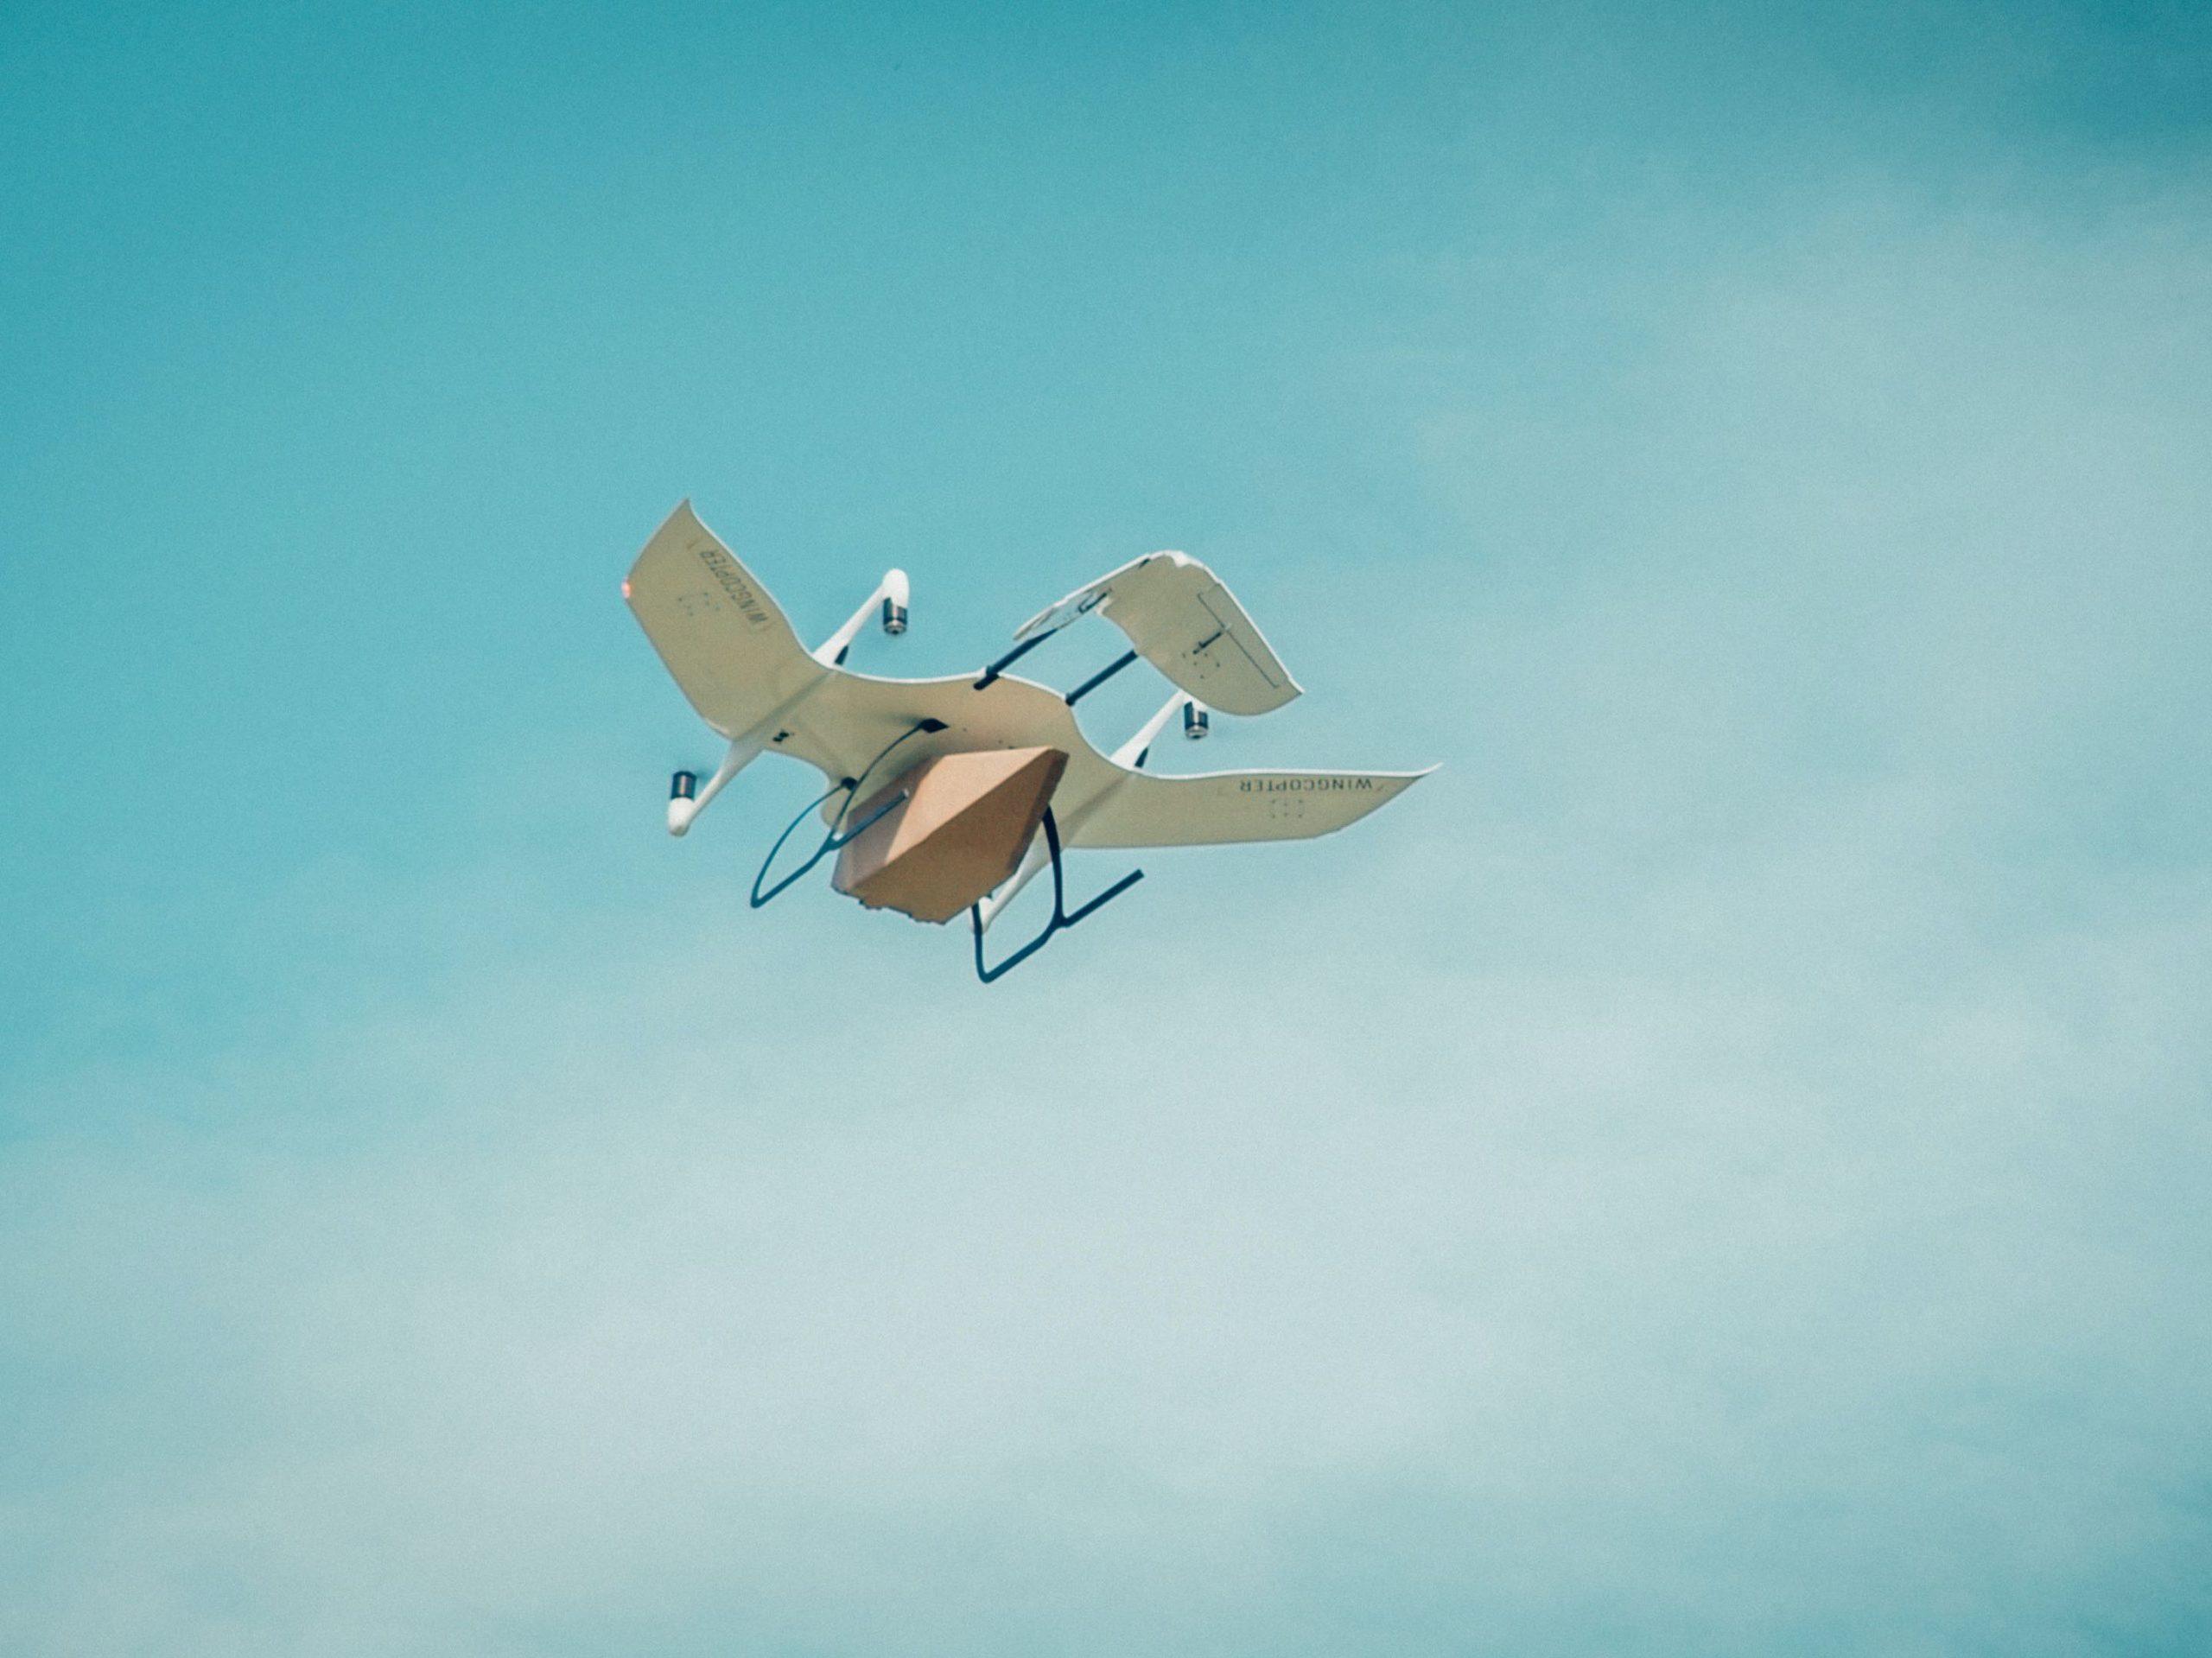 Wingcopter_MVLD_Key Visual_Newsroom